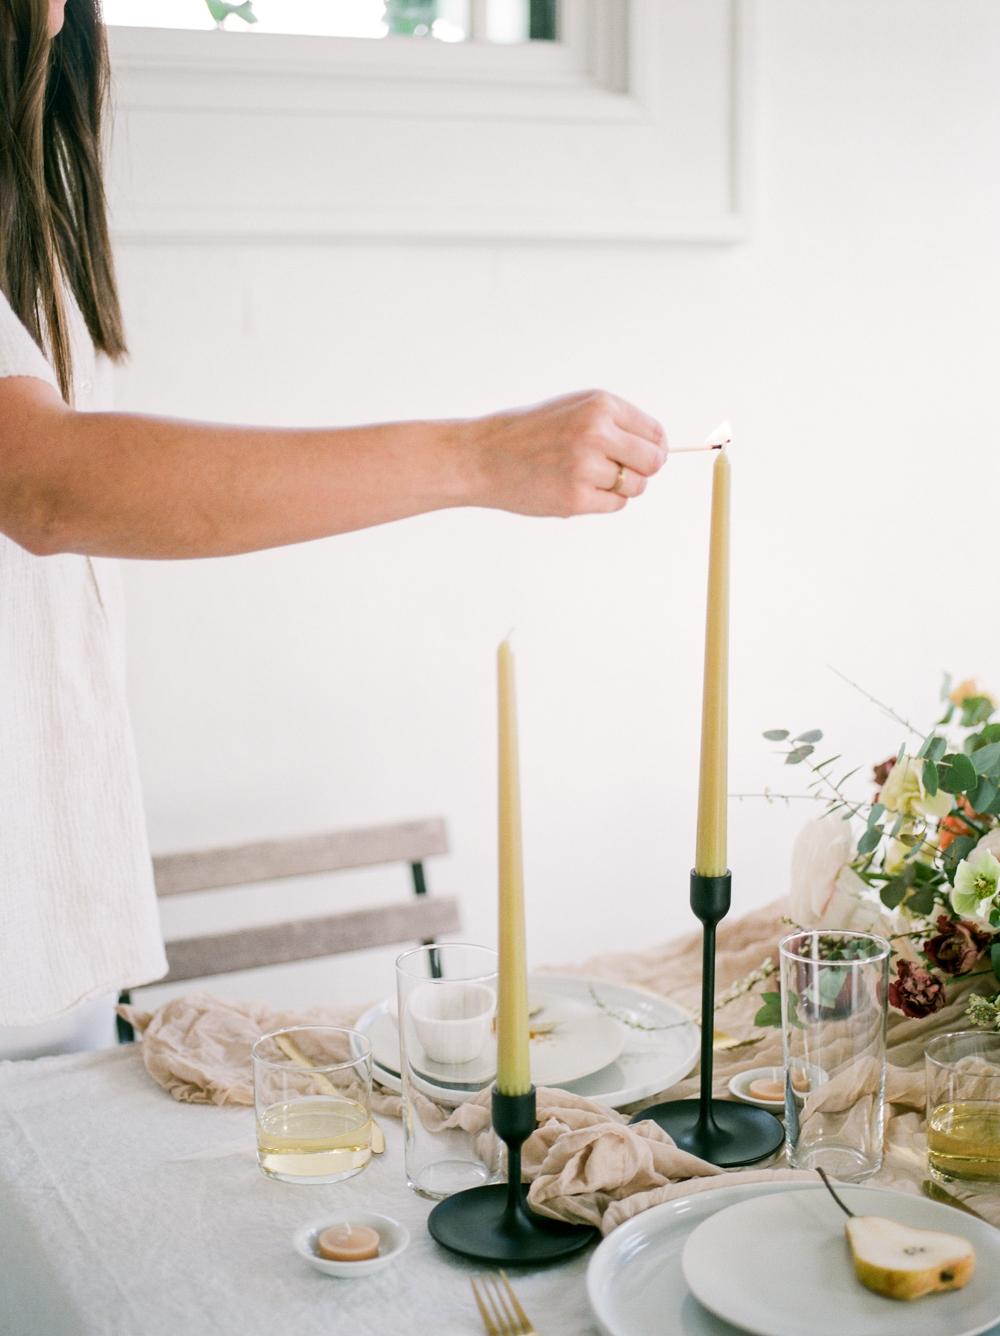 Christine-Gosch-Lexie-Sandberg-Carpe-diem-flowers-florals-design-wedding-flowers-salt-lake-city-branding-photos-styling-bridal-bouquet-centerpieces-film-photographer-12.jpg